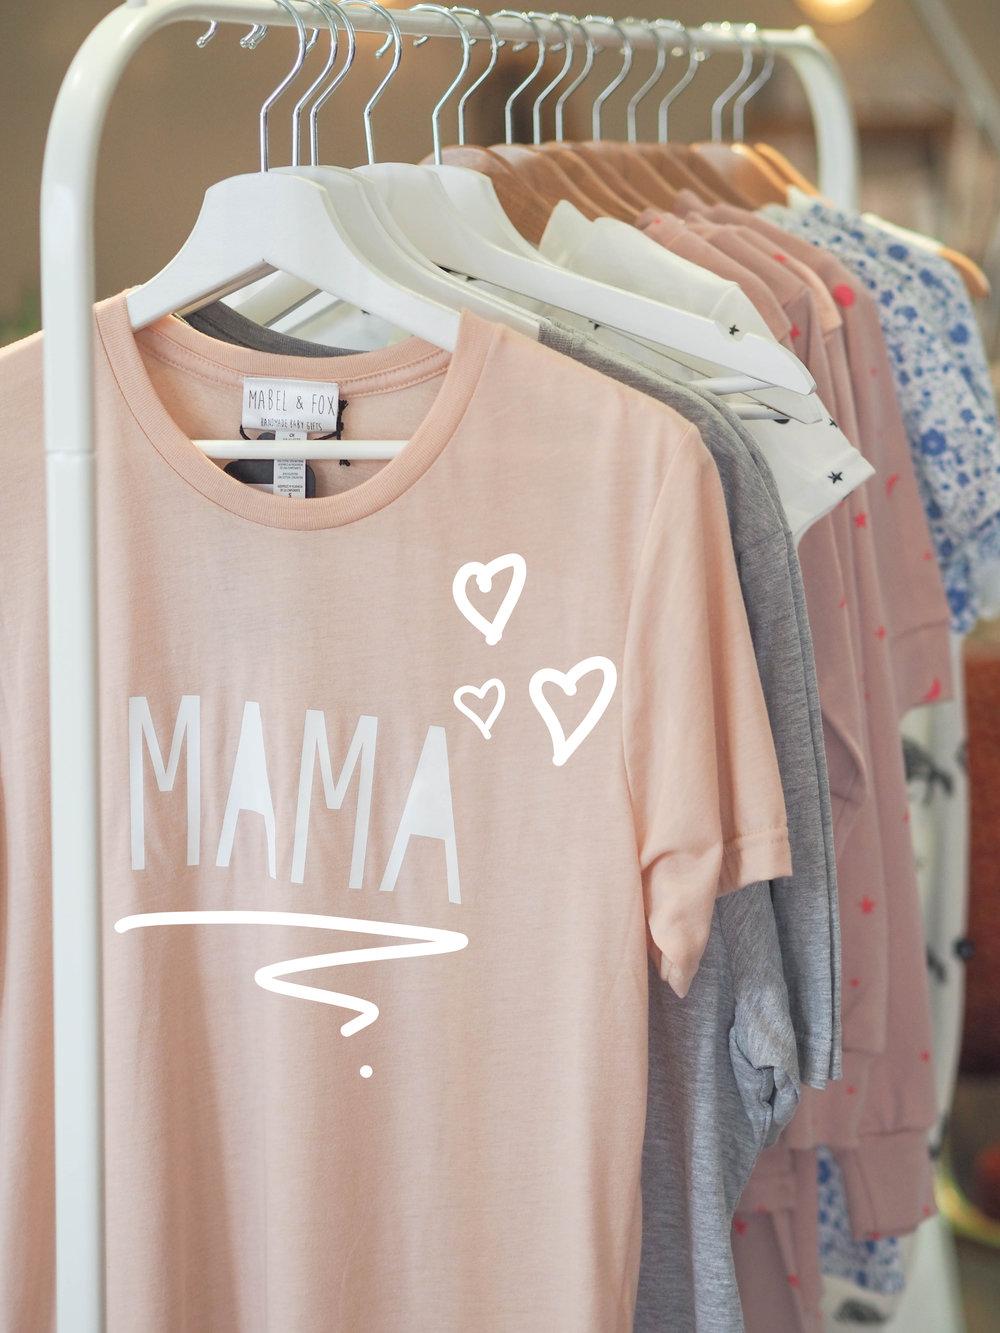 Mamma meet_Mama.jpg